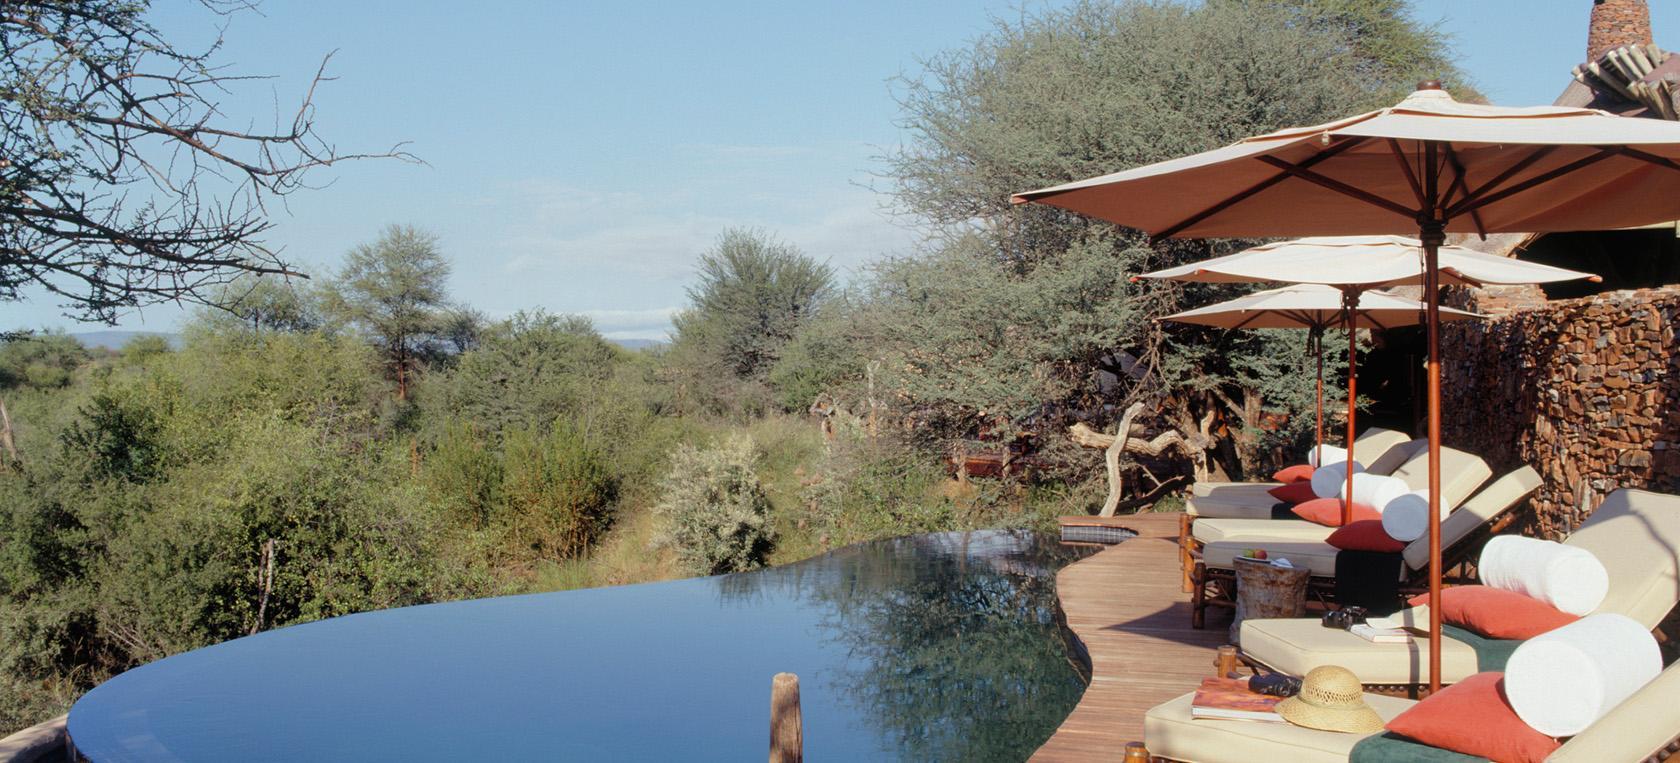 Image of Sanctuary Makanyane Safari Lodge